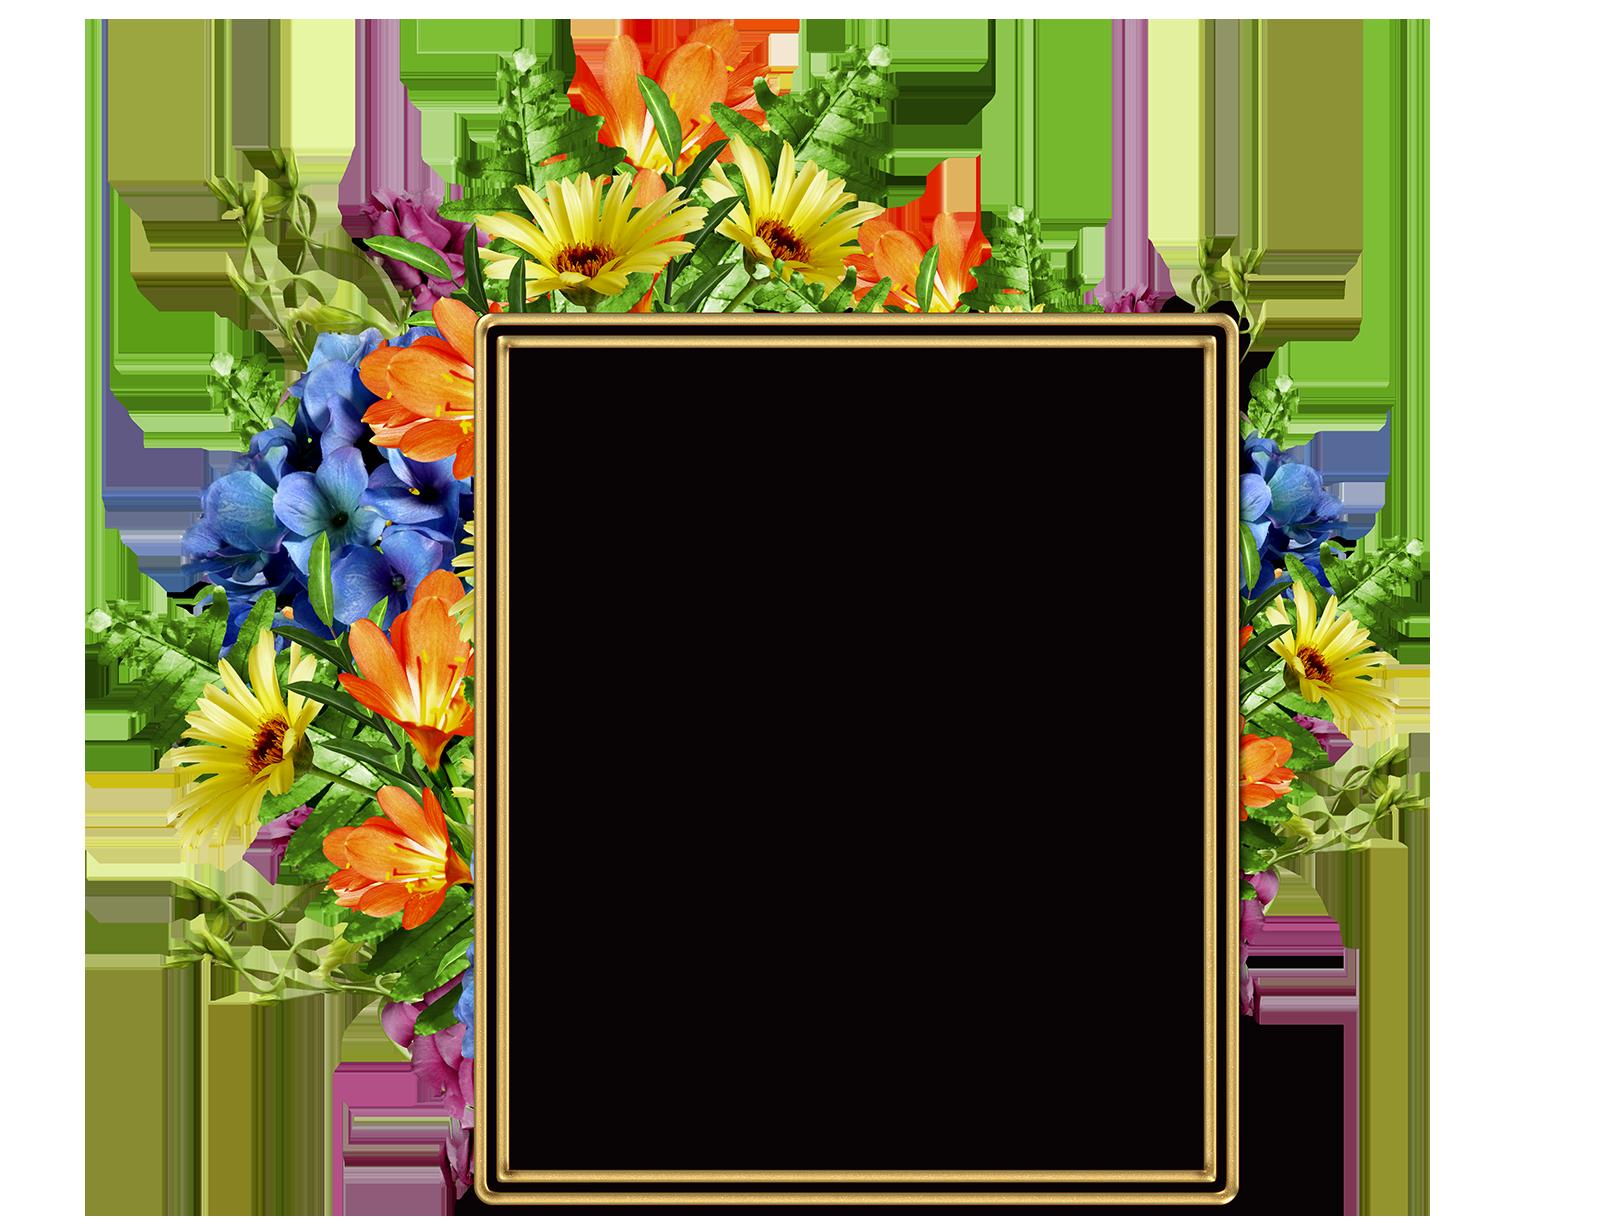 Lindo Marco Para Fotos Con Diversas Flores Bonitas Marco De Flores Png